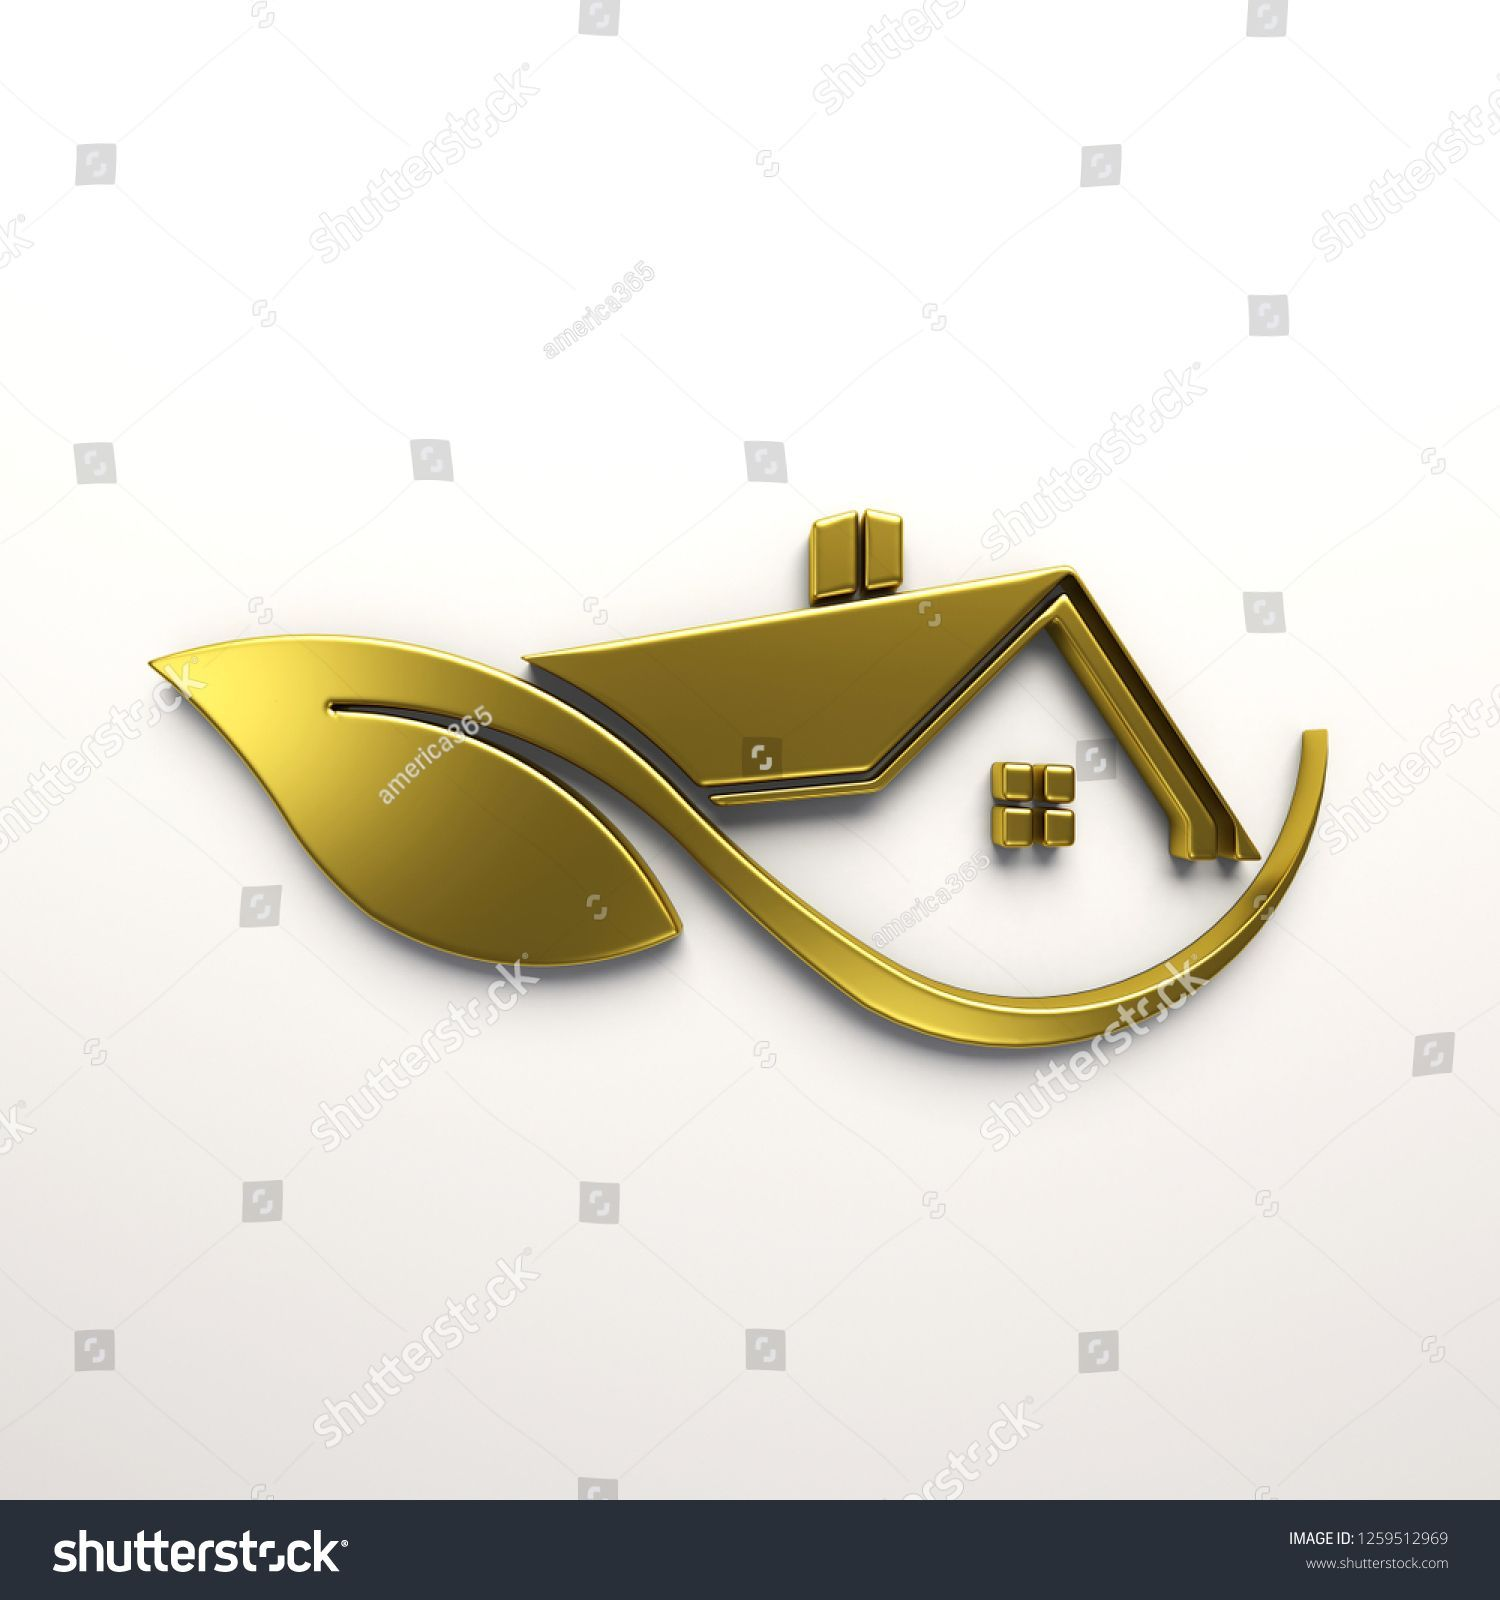 Eco Friendly Gold house Logo. 3D Render Illustration logo